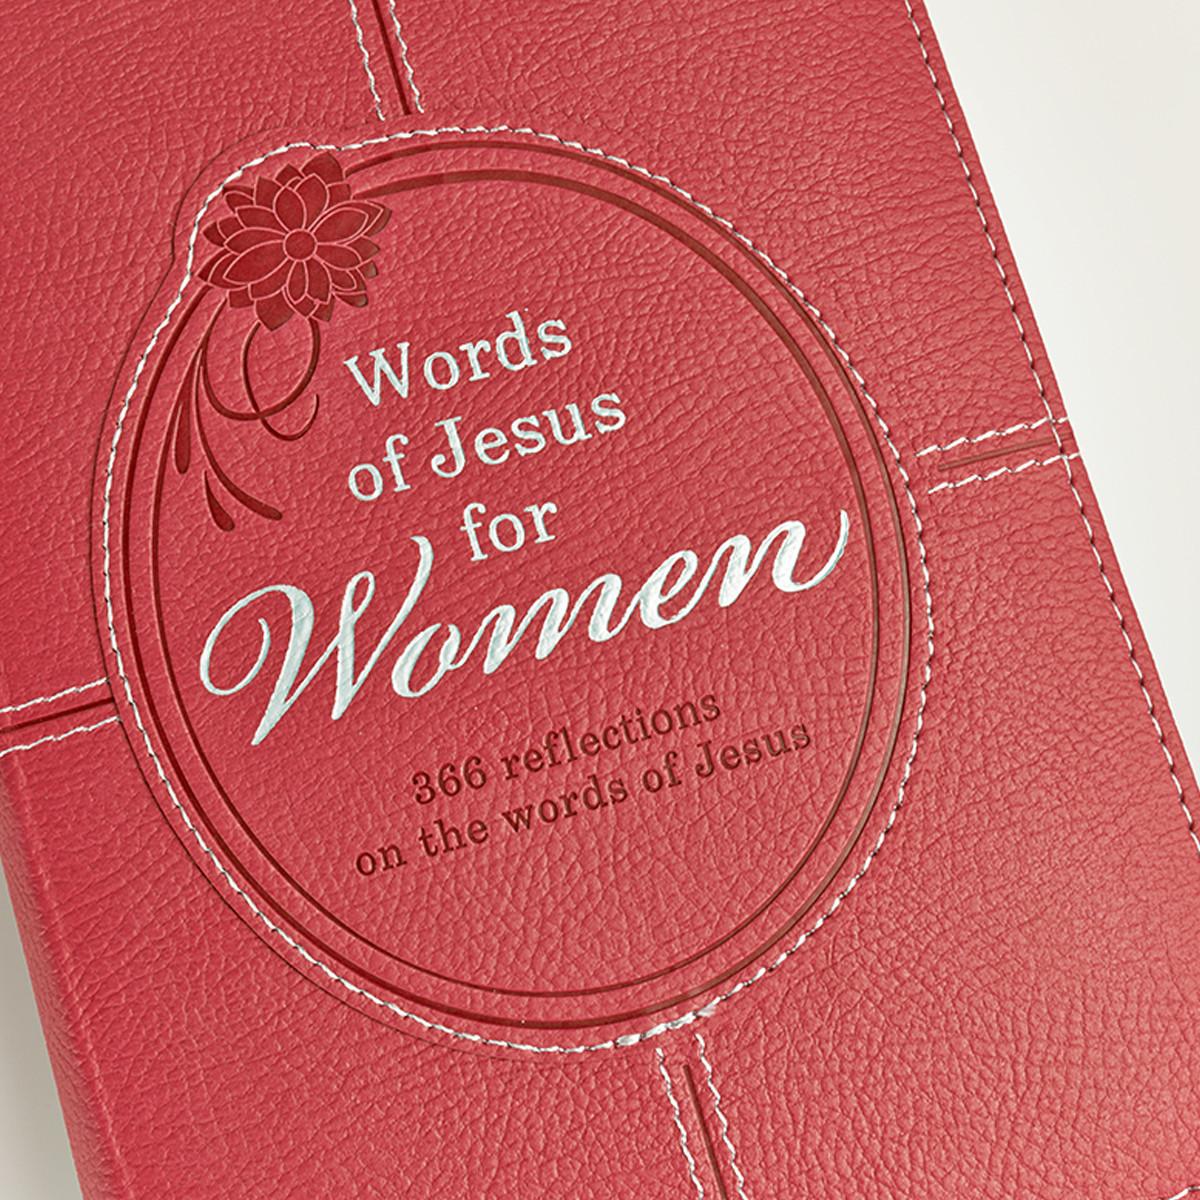 Words of Jesus for Women LuxLeather Edition Devotions